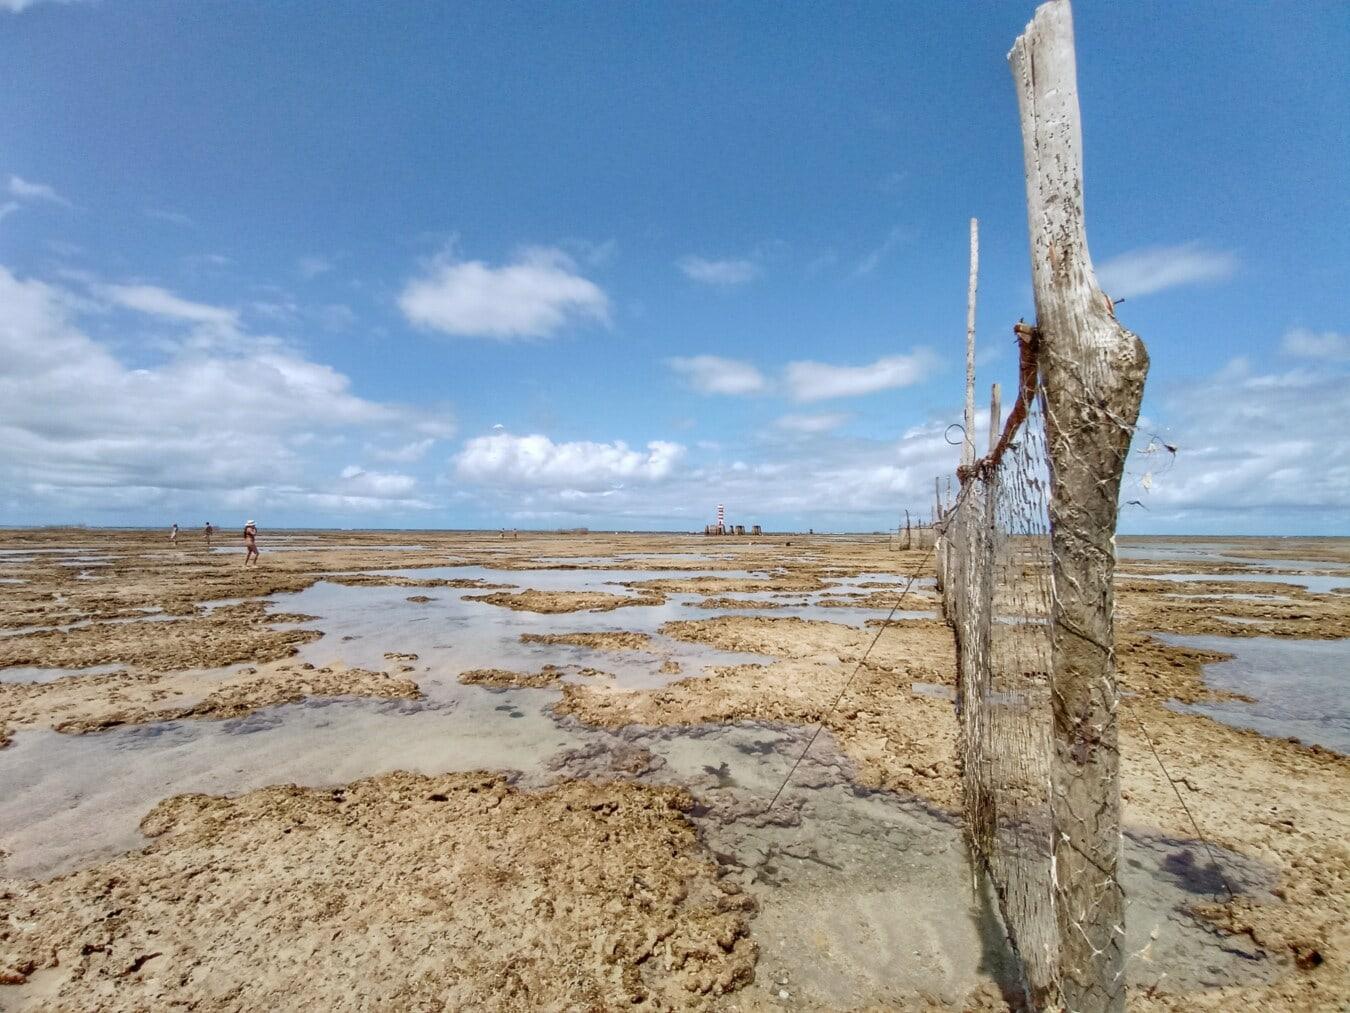 beach, beach erosion, network, coral, driftwood, nature, landscape, water, sand, wasteland